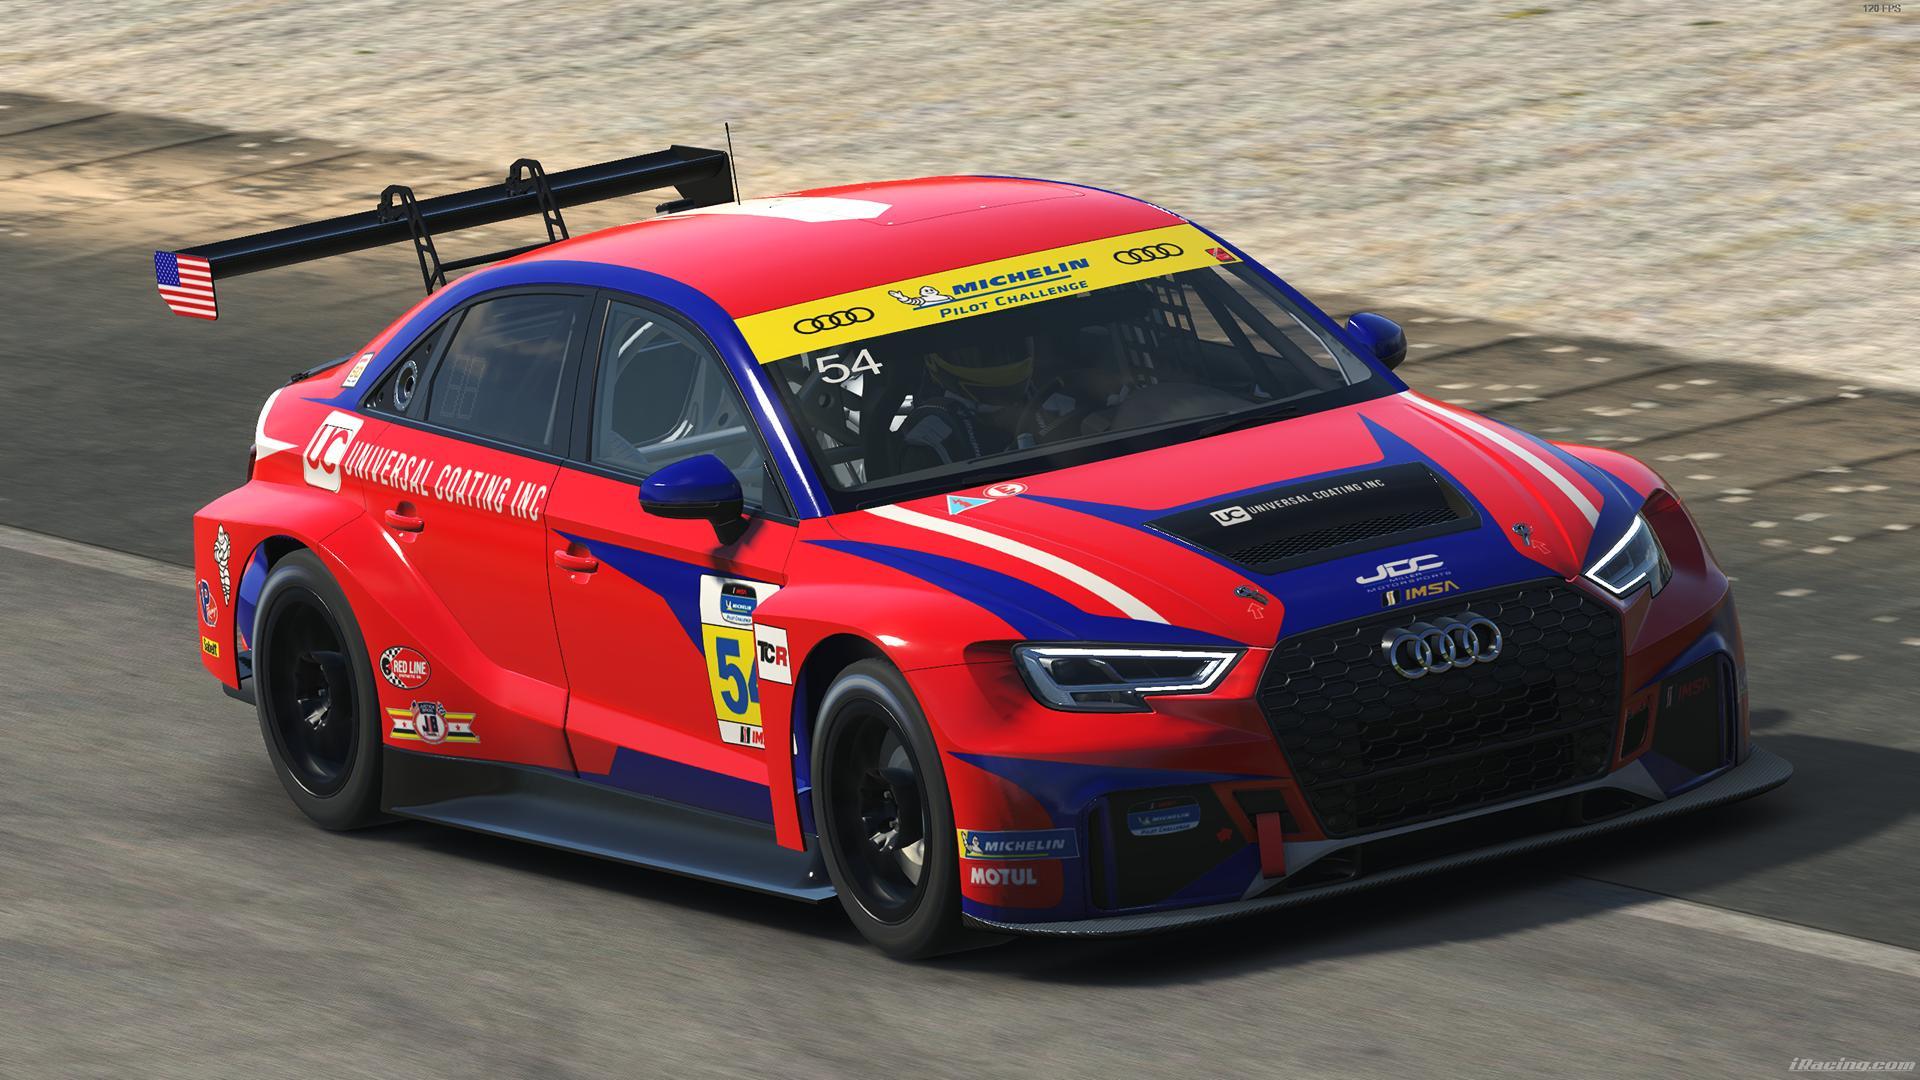 Preview of 2019 IMSA TCR - #54 JDC Miller Motorsports by Jann Dircks